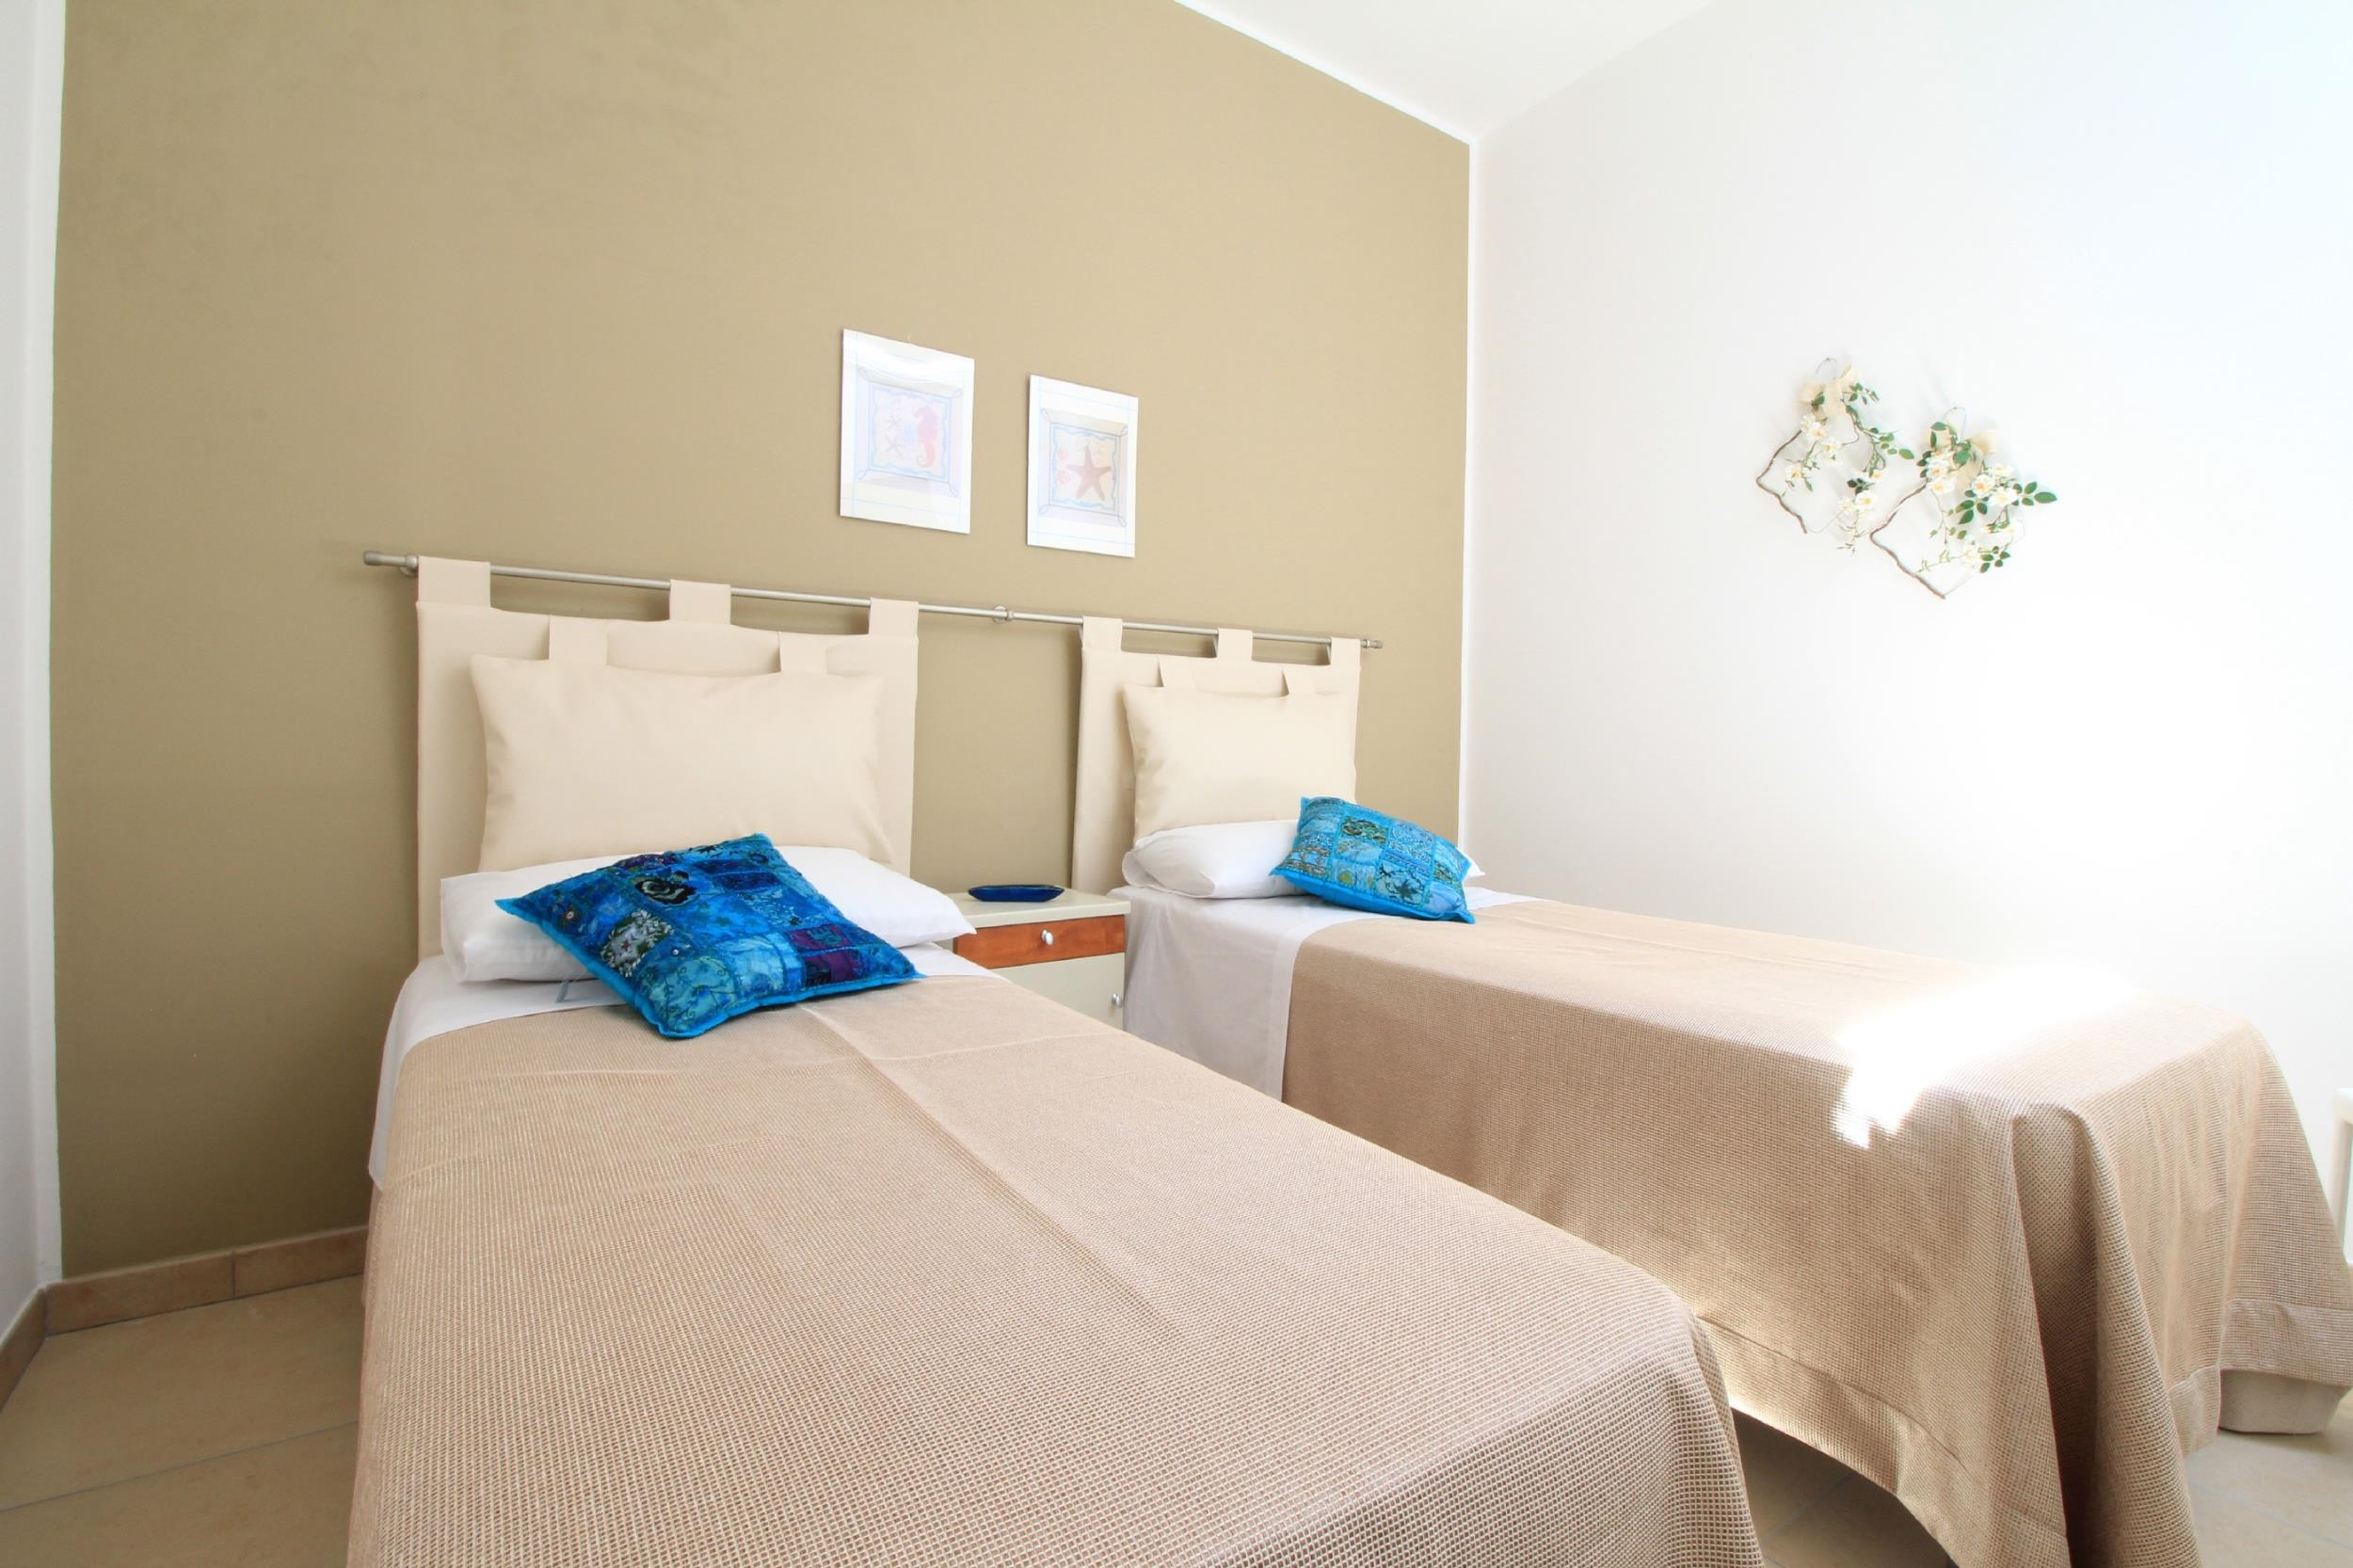 Apartment Elcisia luxe beach house photo 23457104